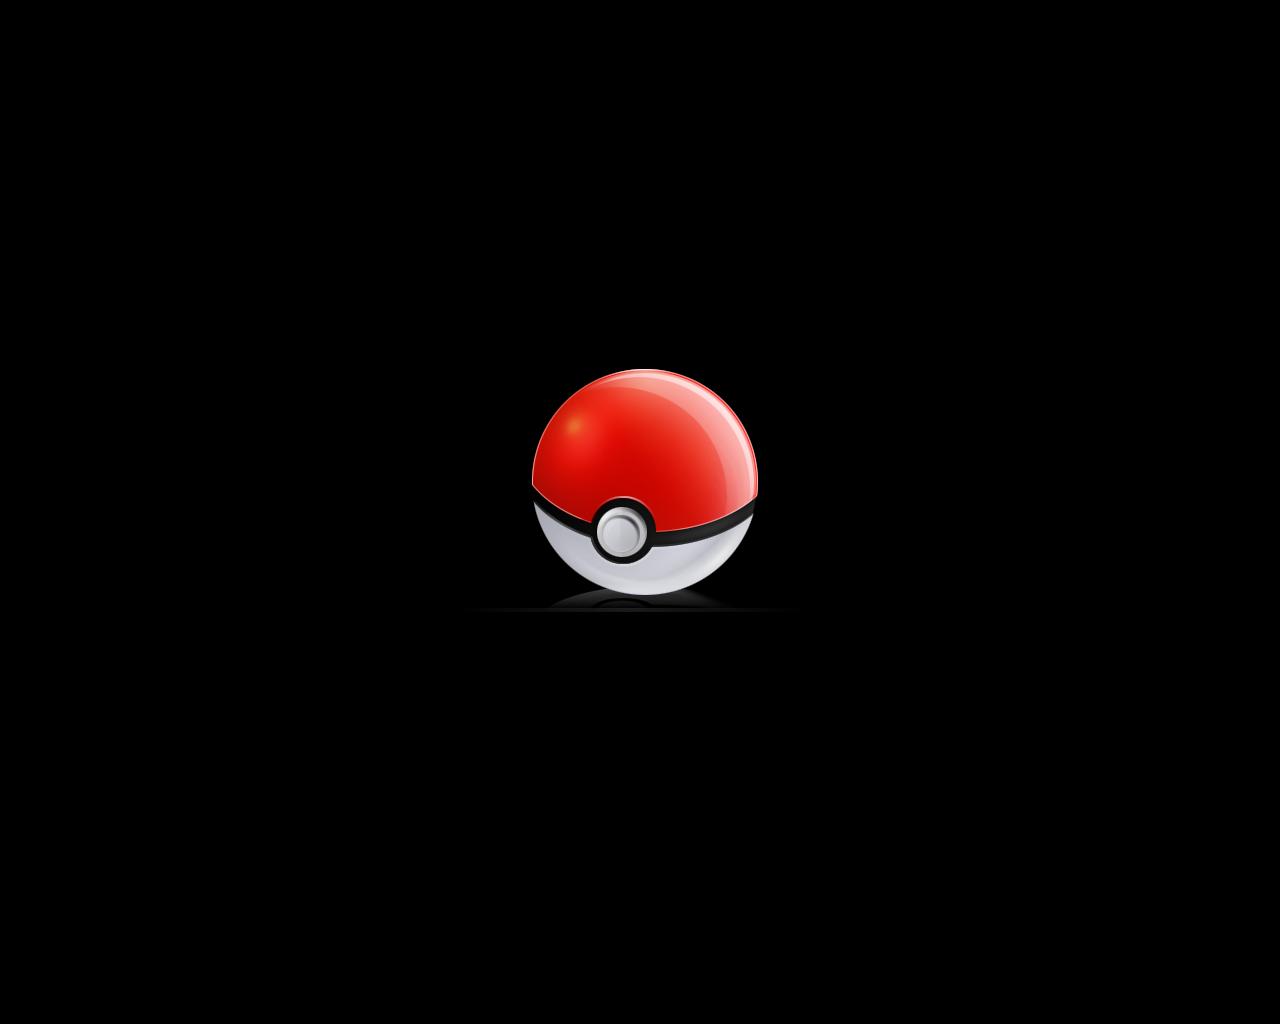 Pokemon Poke Balls Pokeball Hd Wallpaper Of Anime Manga Apps 1280x1024